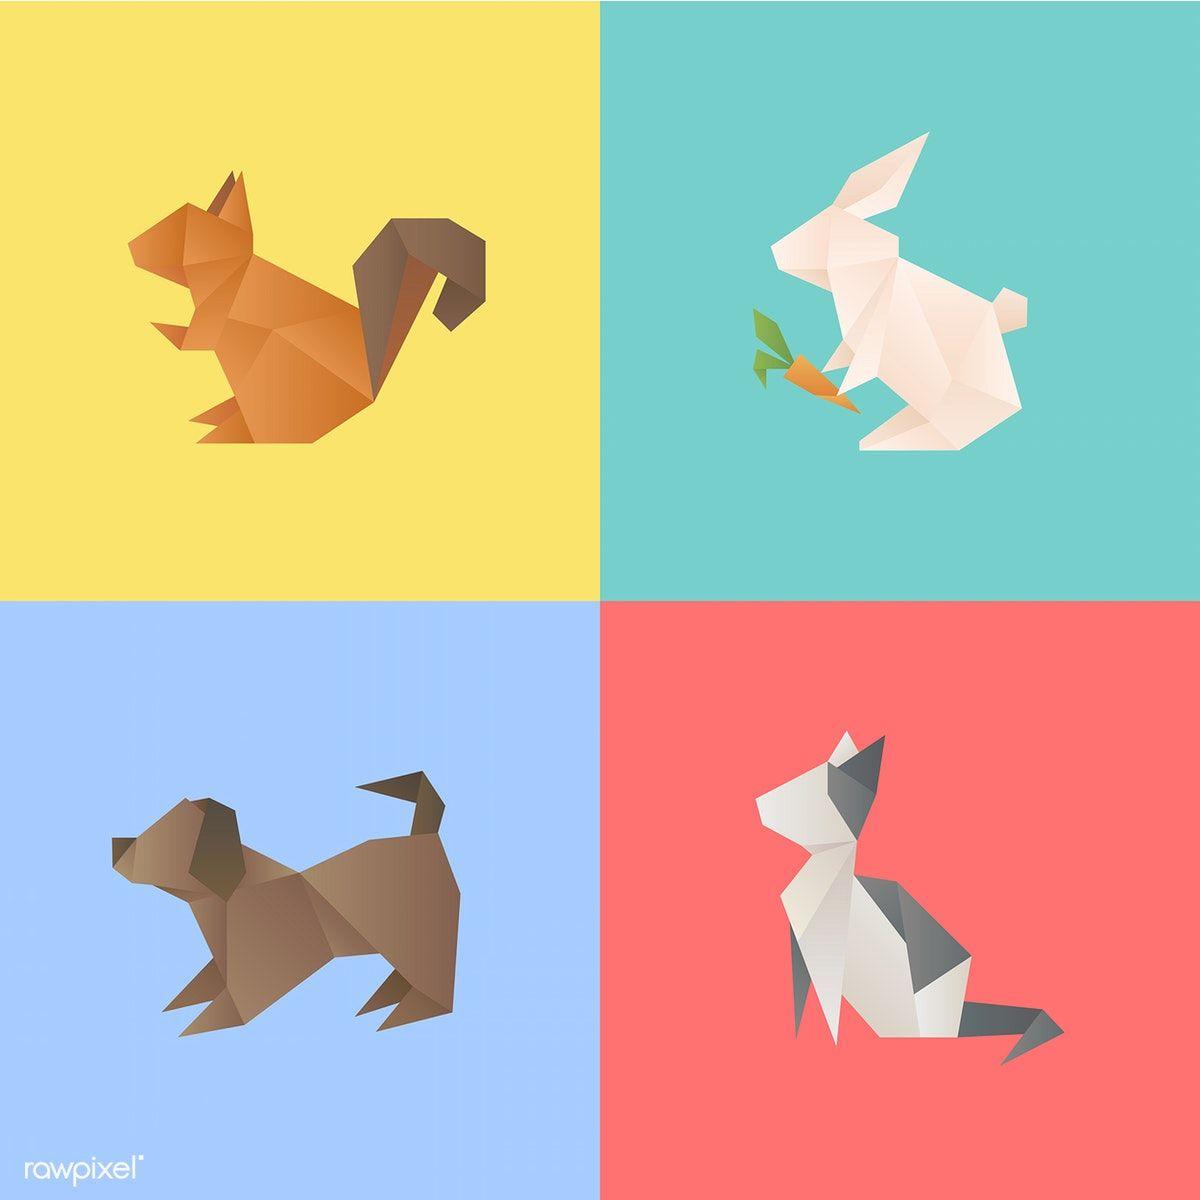 Animal Vector Free Image By Rawpixel Com Free Illustrations Geometric Animals Illustration